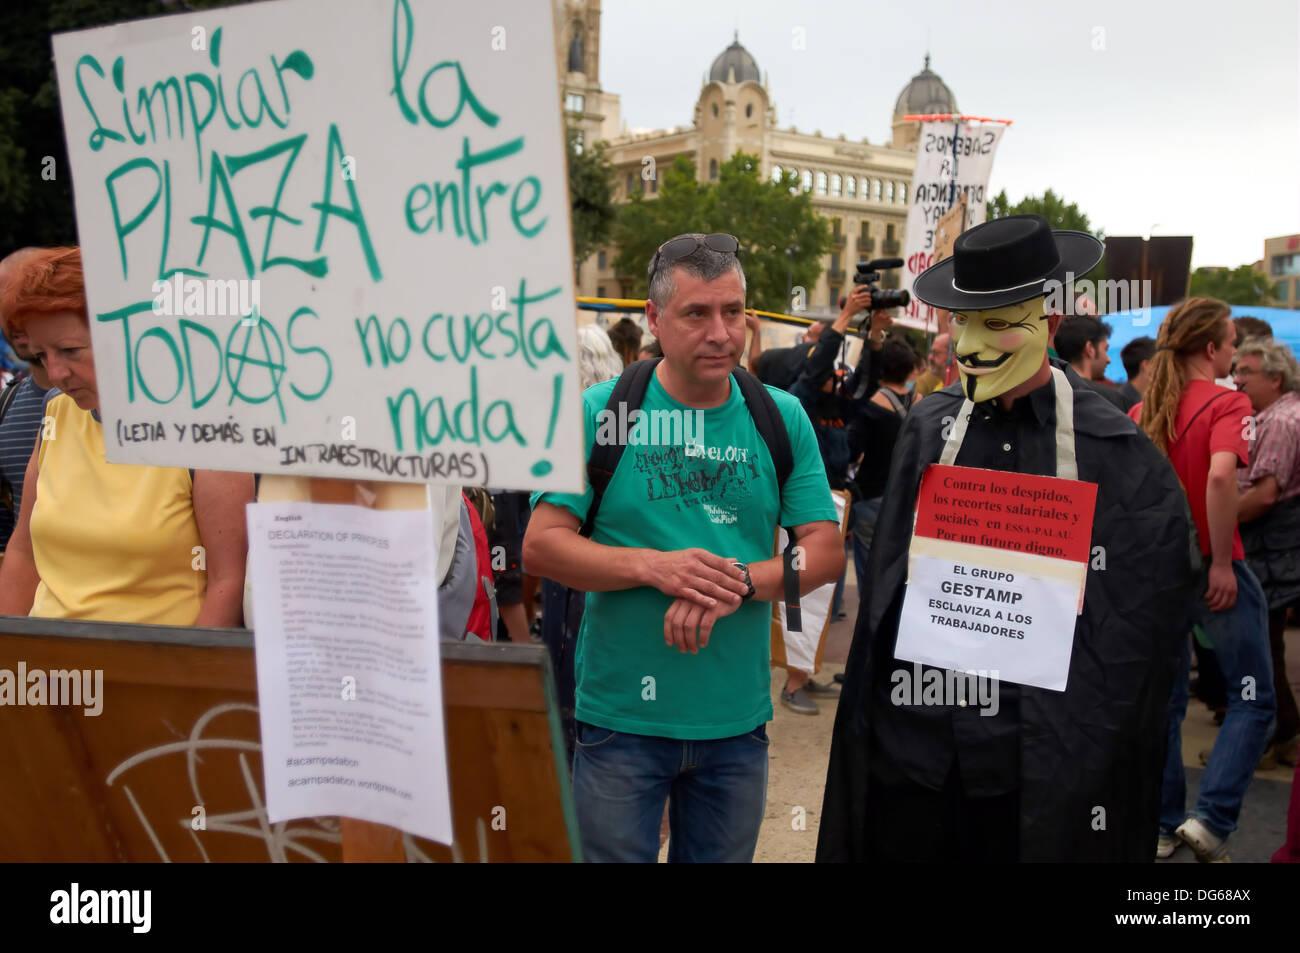 -Anonymous- Indignant Movement 15M, Barcelona (Spain). - Stock Image